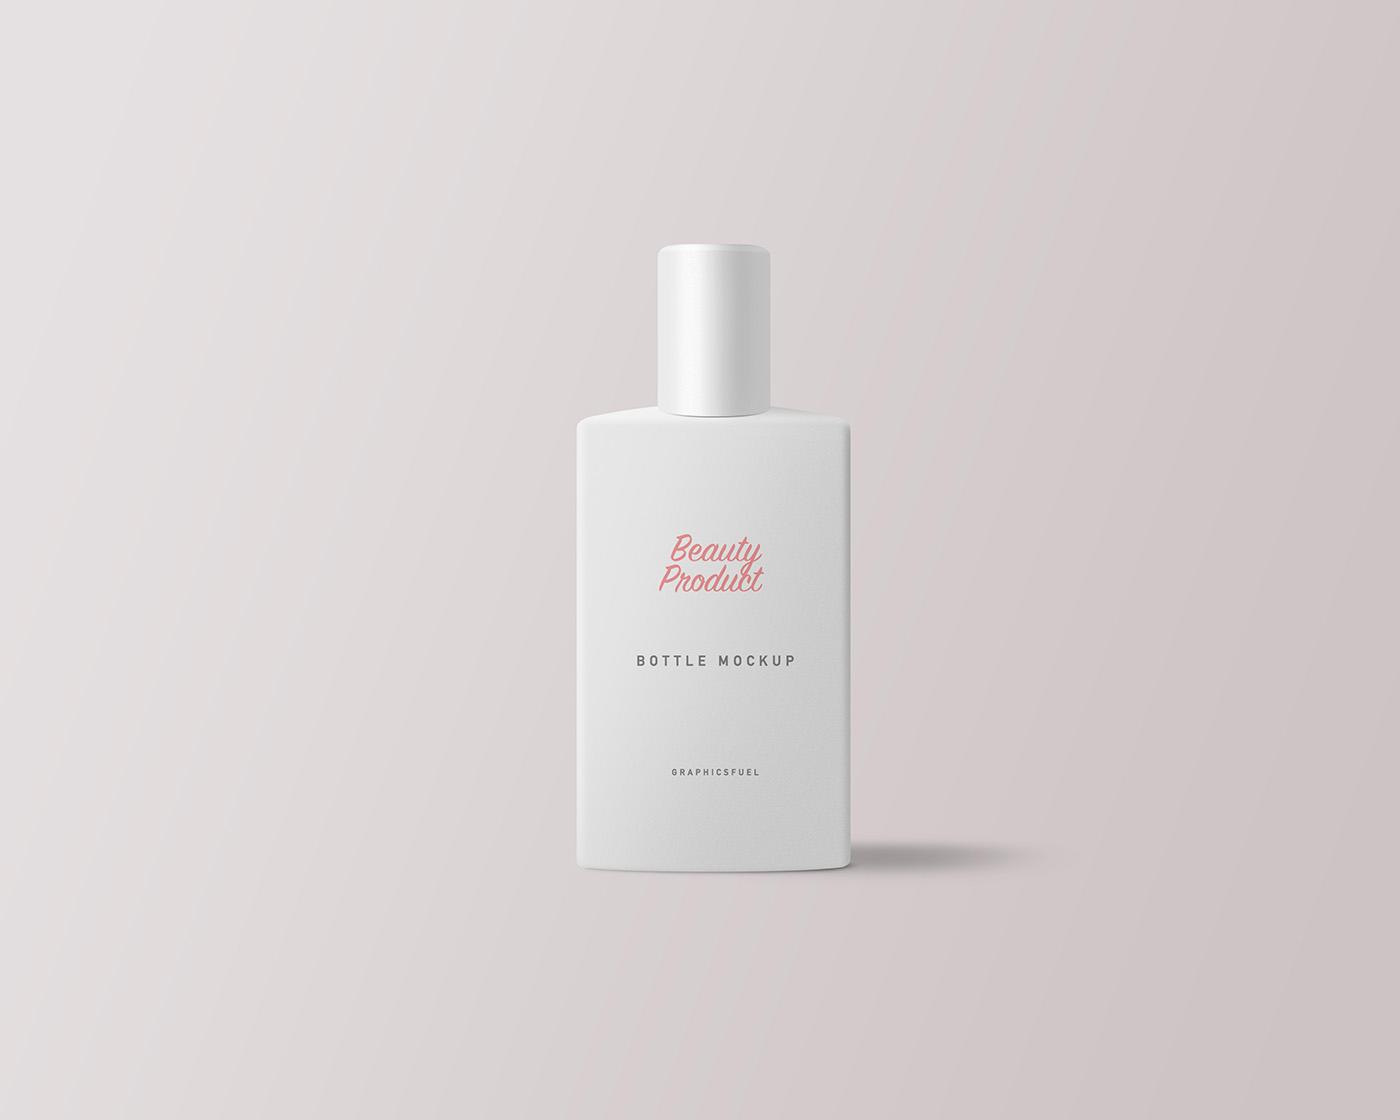 Cosmetic Product Bottle Mockup